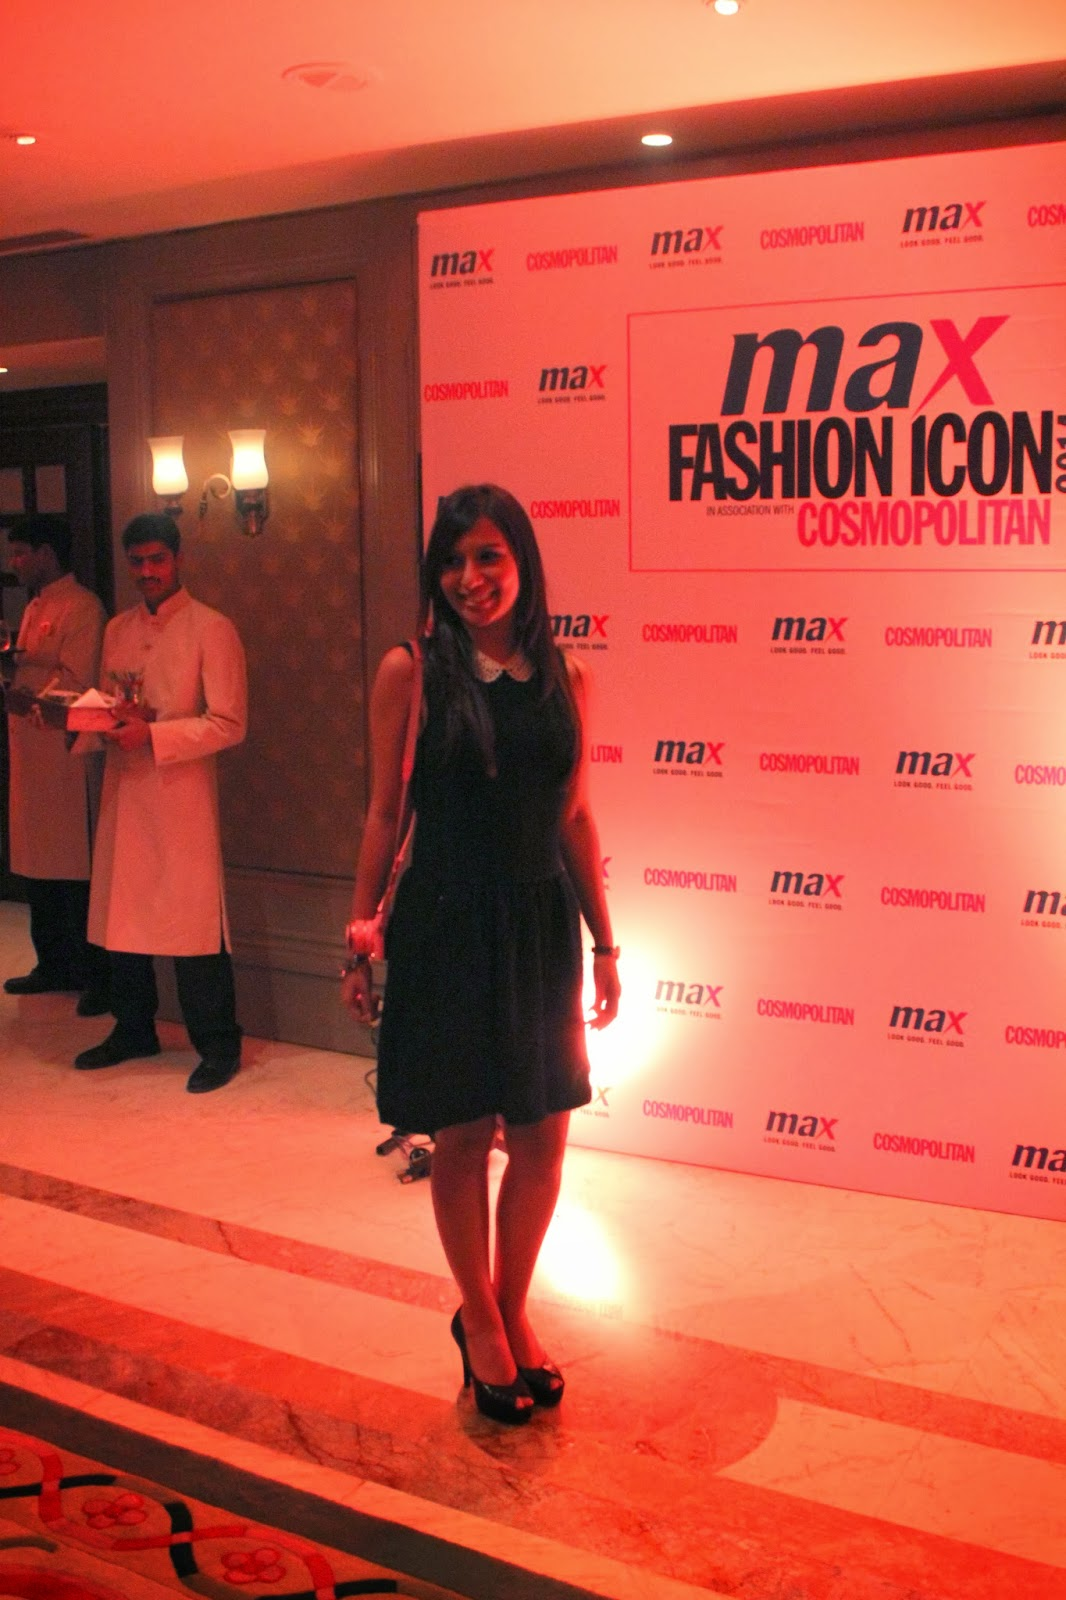 Miss Malini - MAX Fashion Icon 2014 In Collaboration  With Cosmopolitan Magazine Grand Finale - All Pictures, Uncut Version